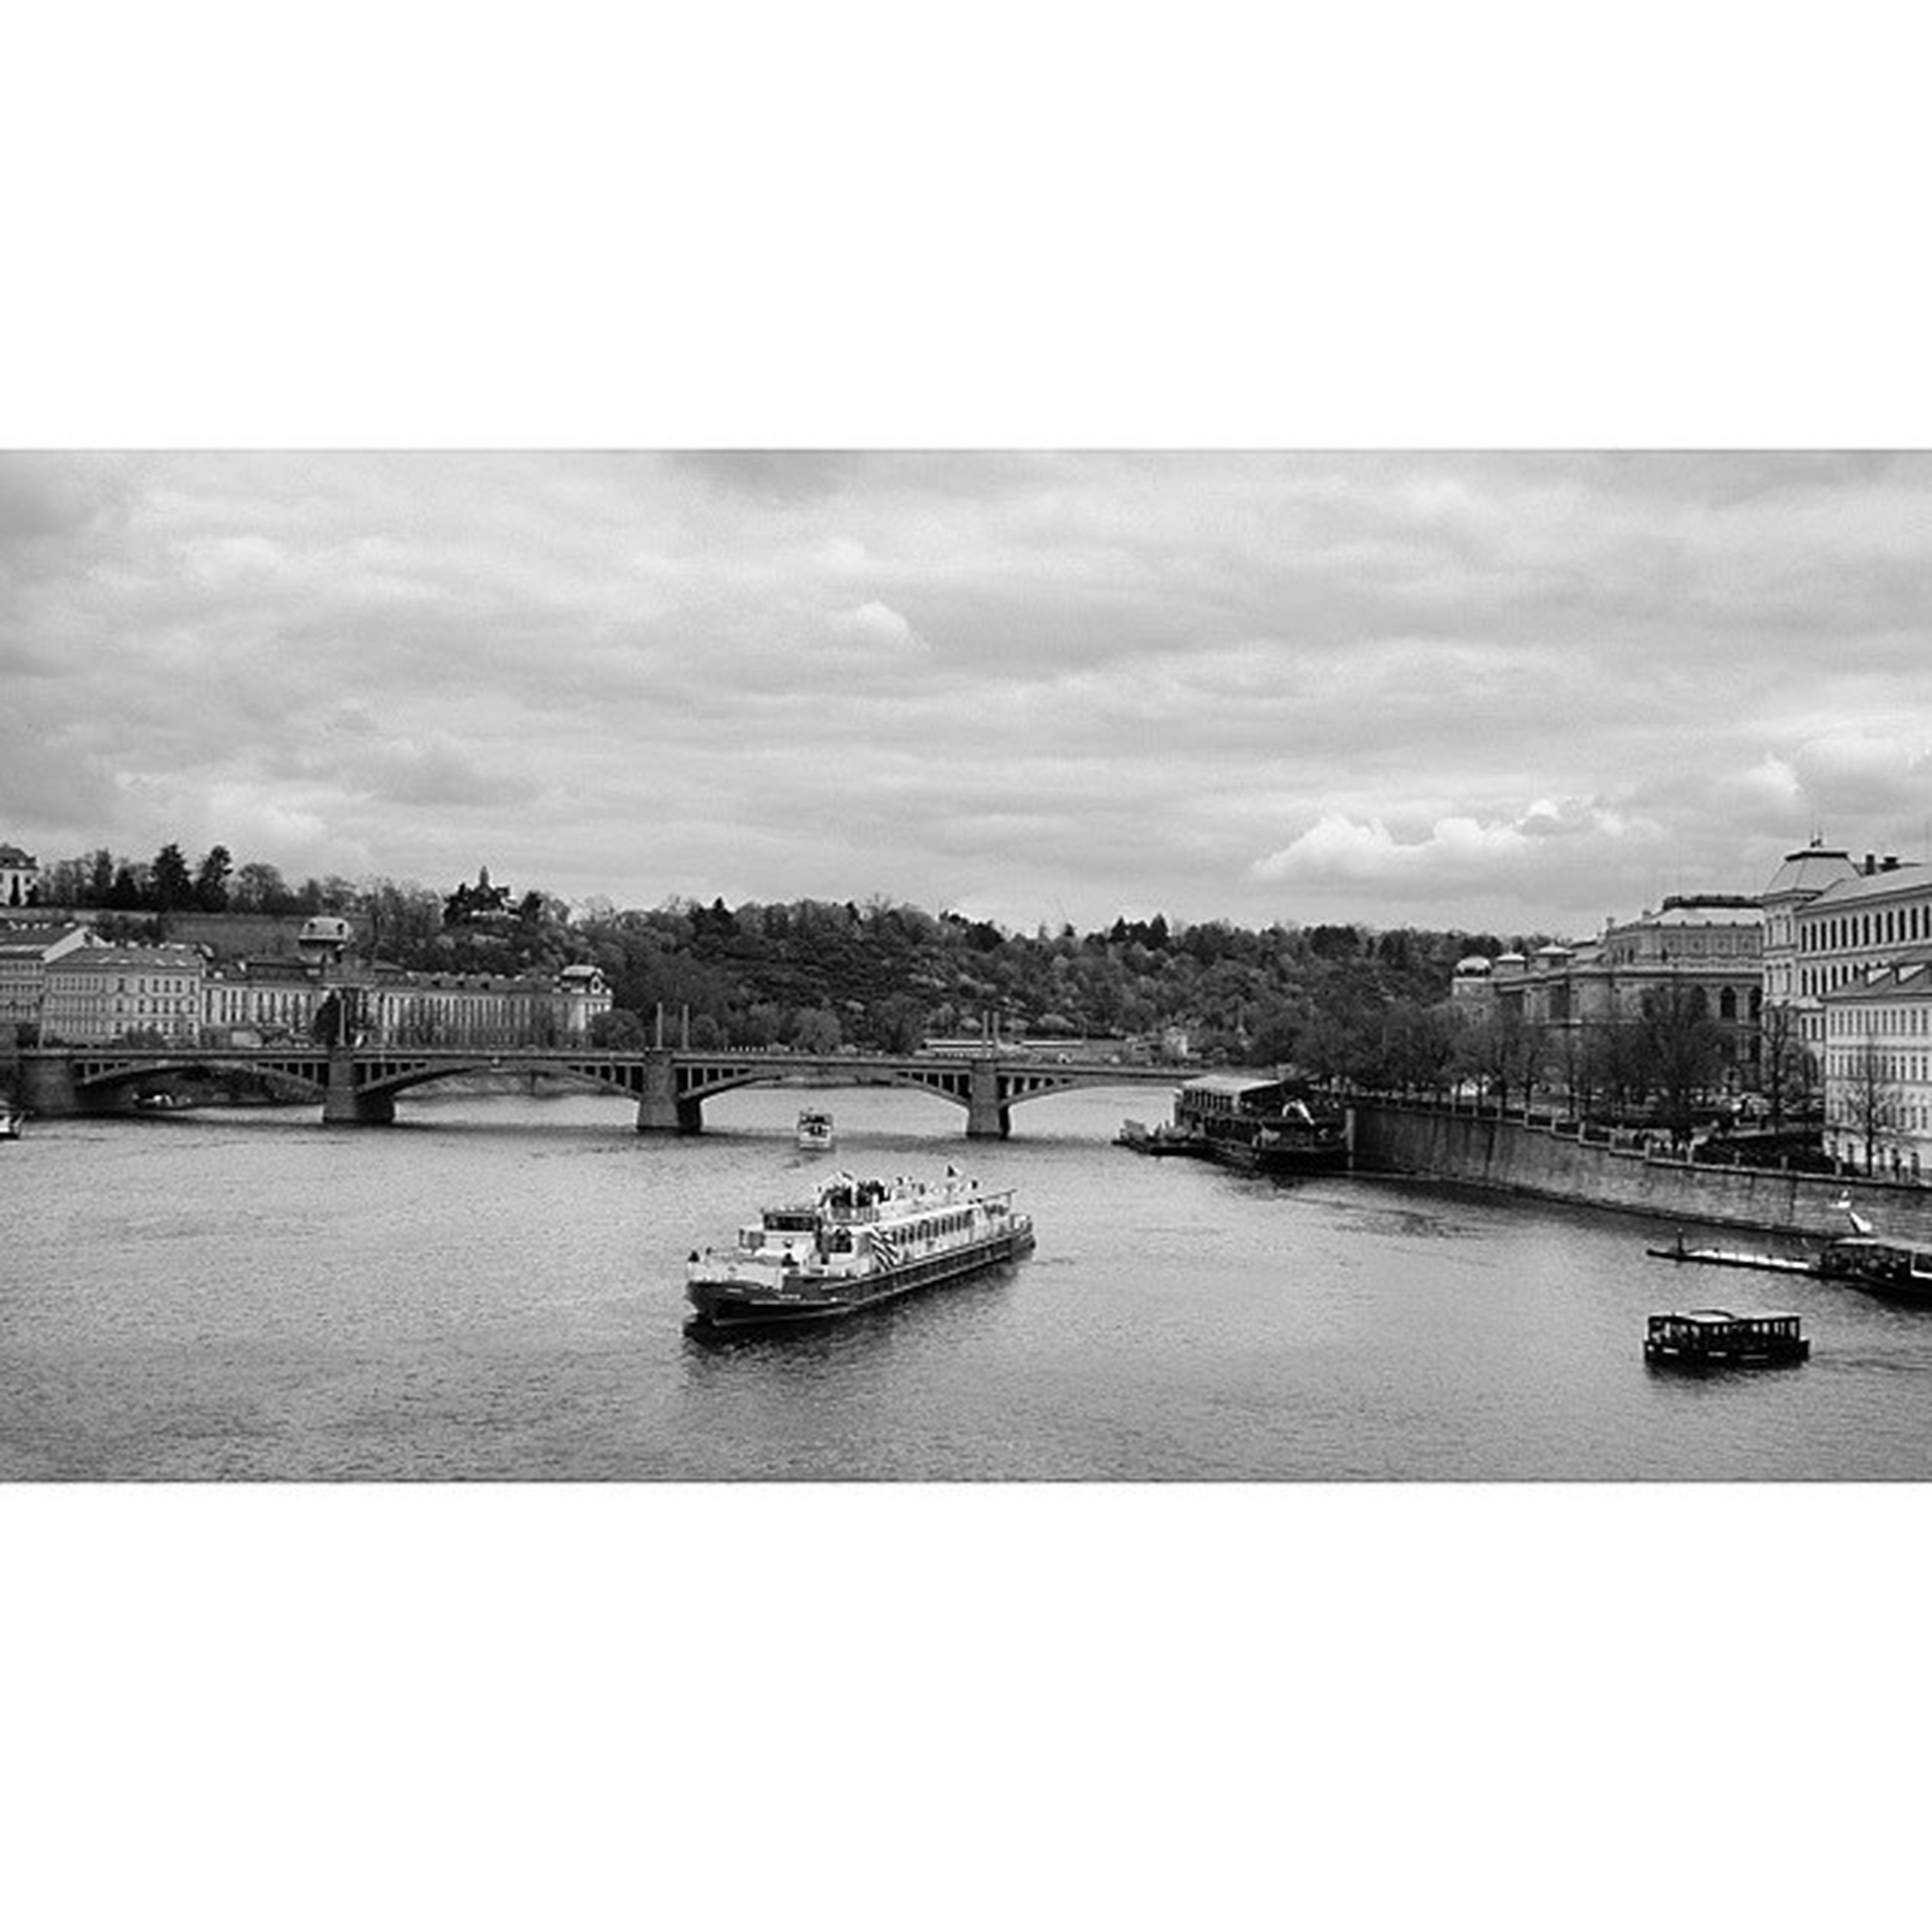 Beautiful Nature . View of VltavaRiver vltava river from the Karlúvmost bridge CharlesBridge . Prague praha czech republic CzechRepublic. Taken by my SonyAlpha dslr a57. طبيعة نهر جسر براغ جمهورية التشيك.